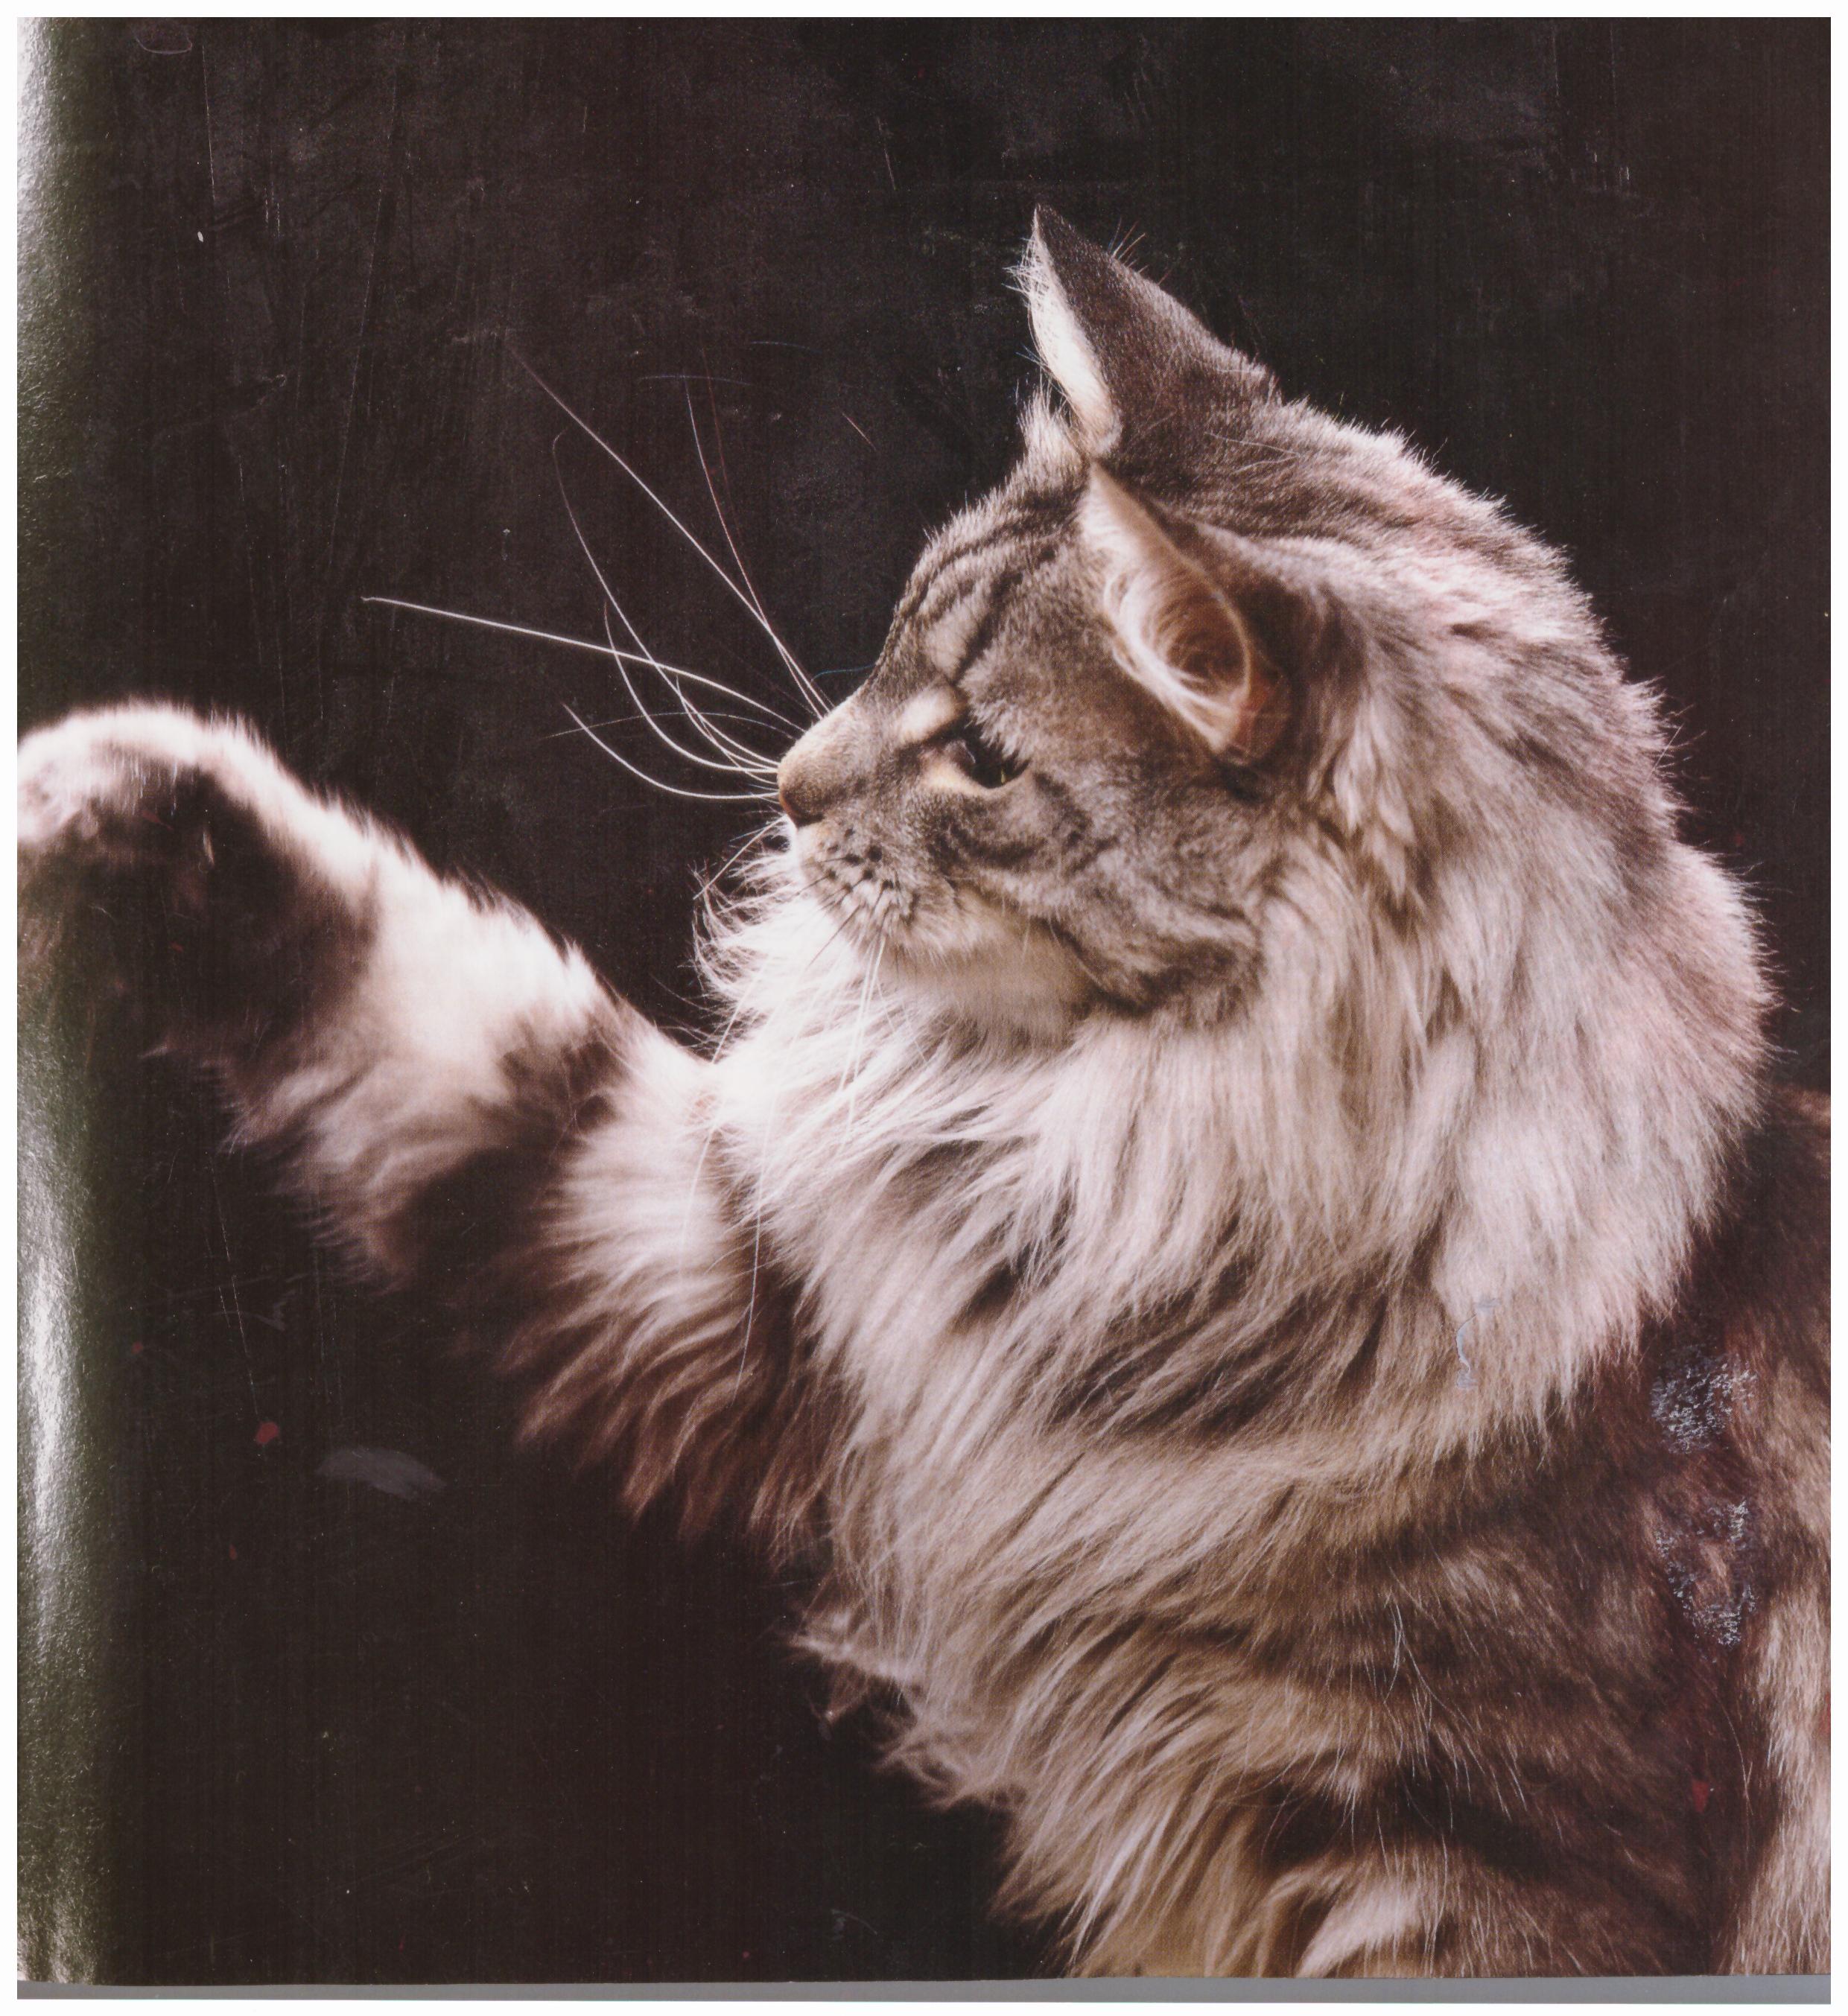 Torvemyra's Grand Soltario 1983-84